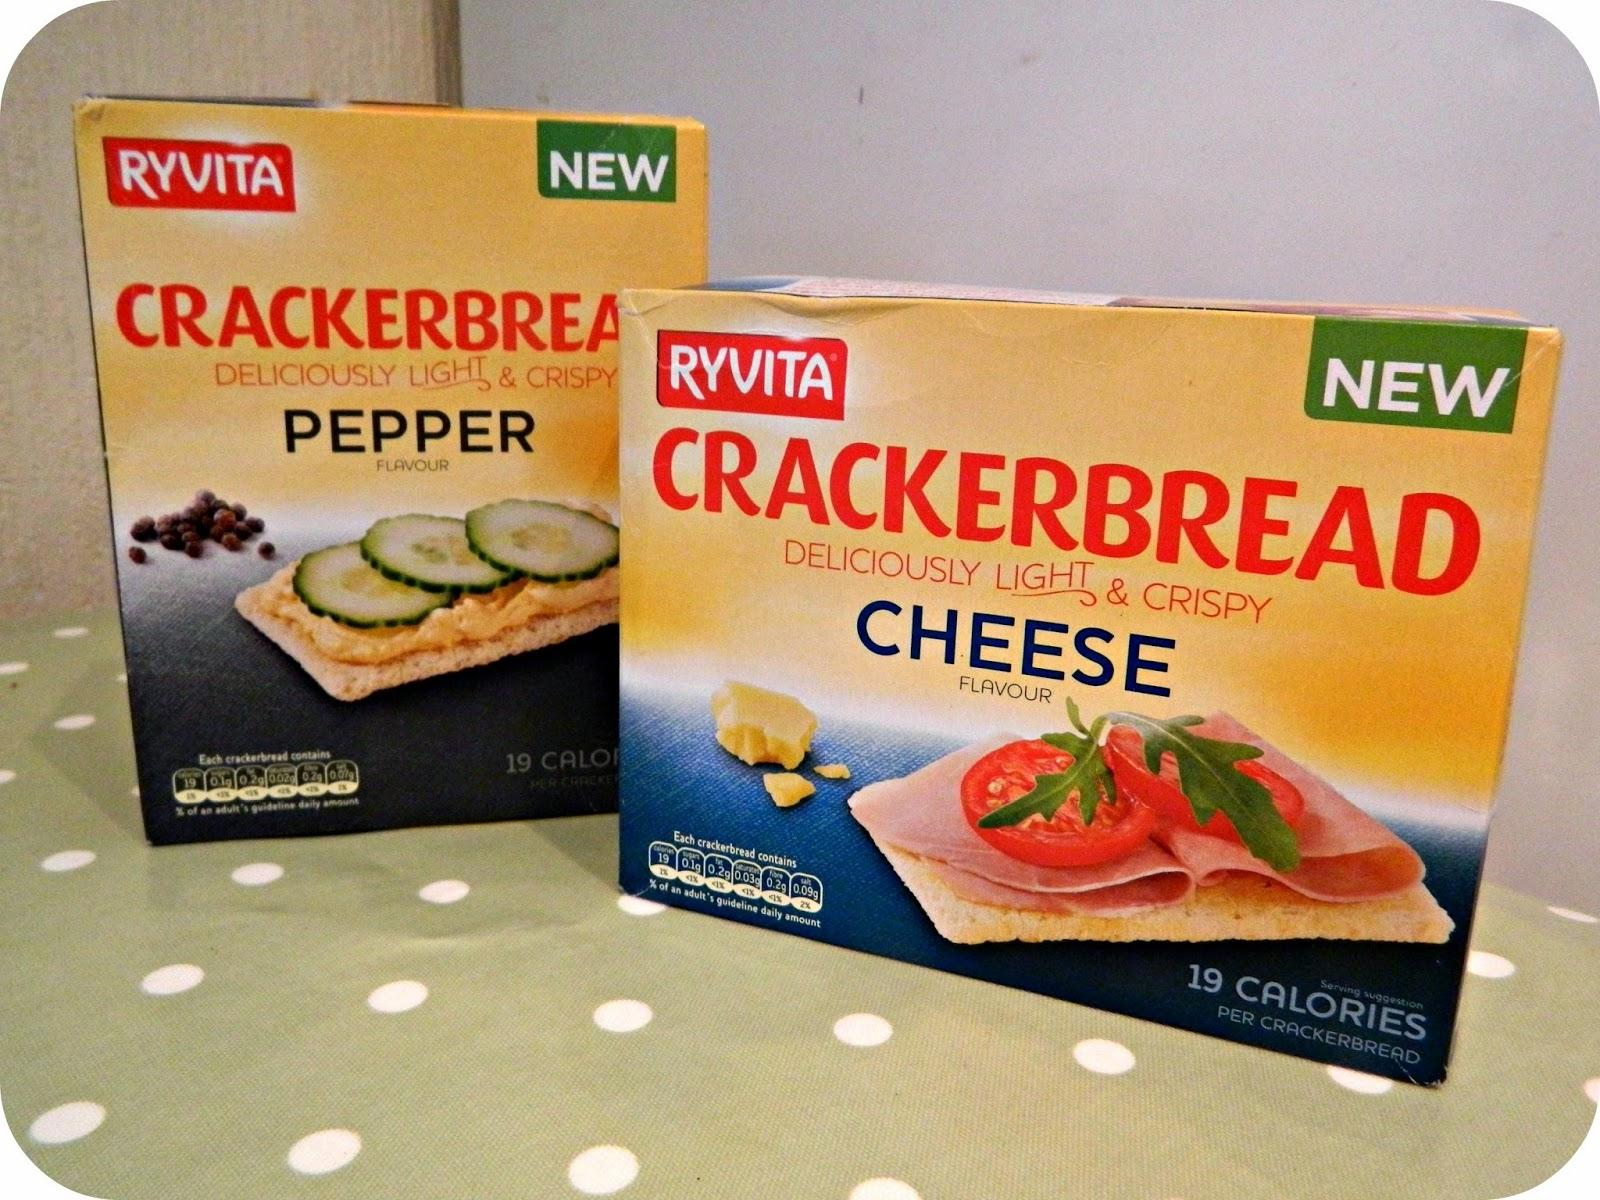 Ryvita Crackerbread Cheese and Pepper